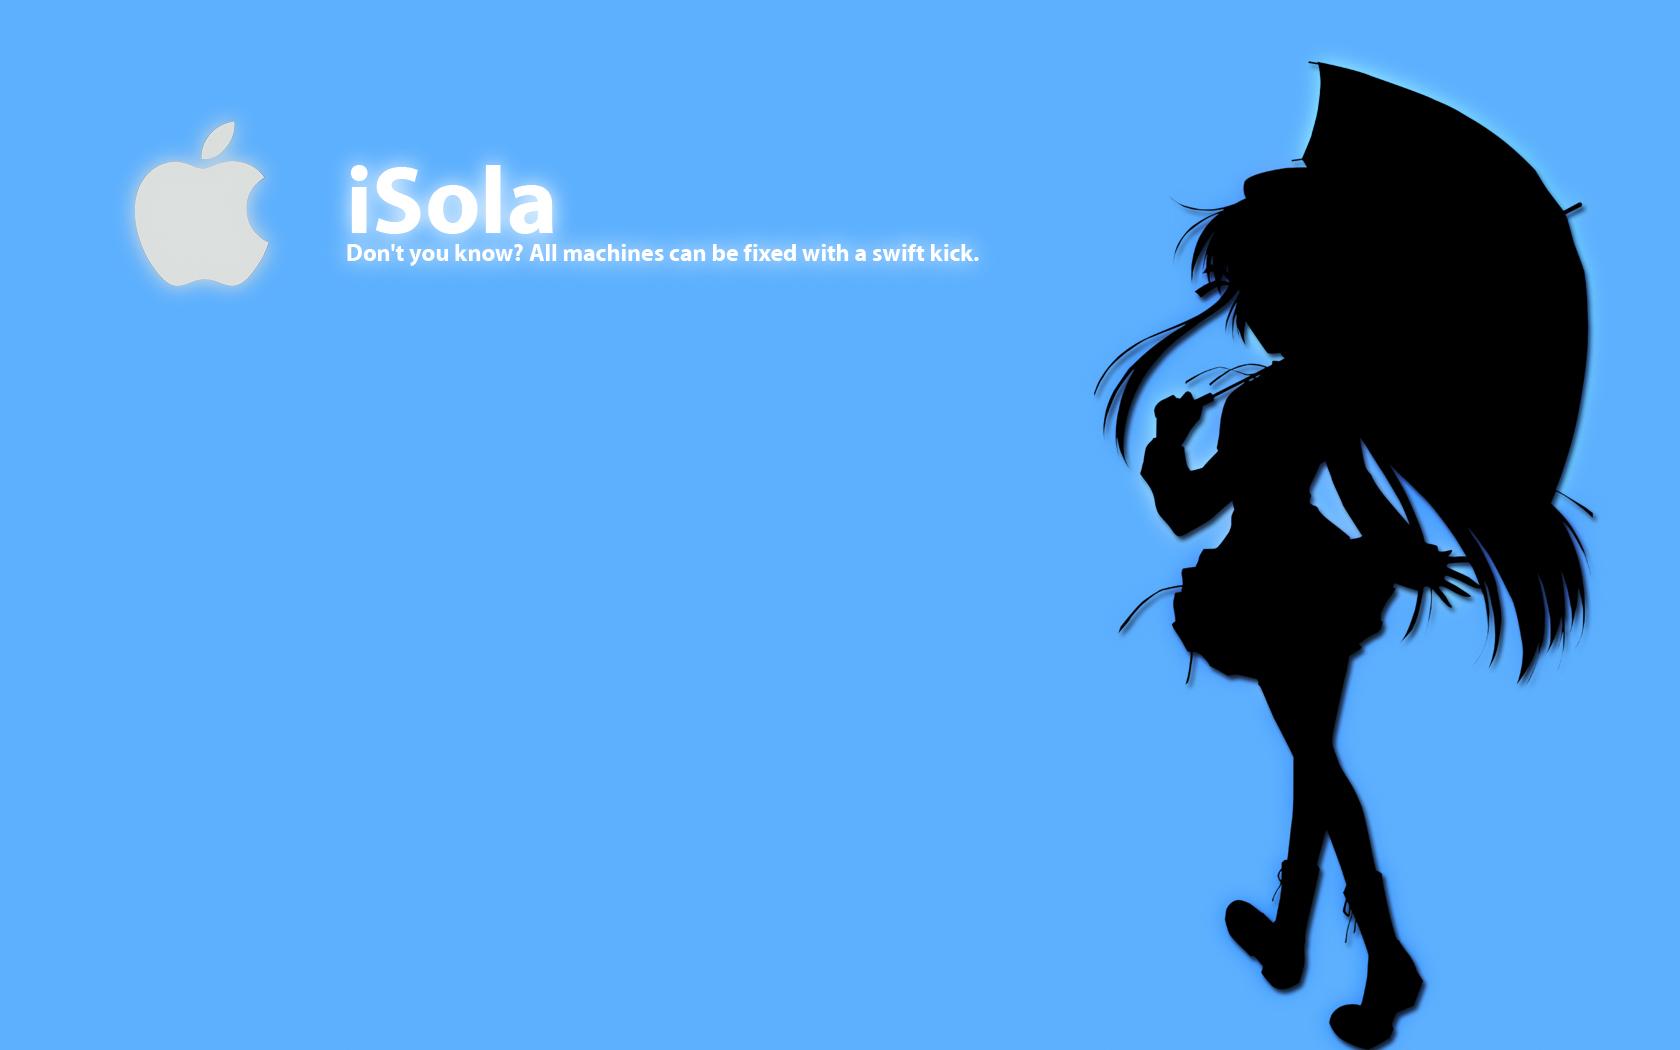 blue ipod polychromatic shihou_matsuri silhouette sola